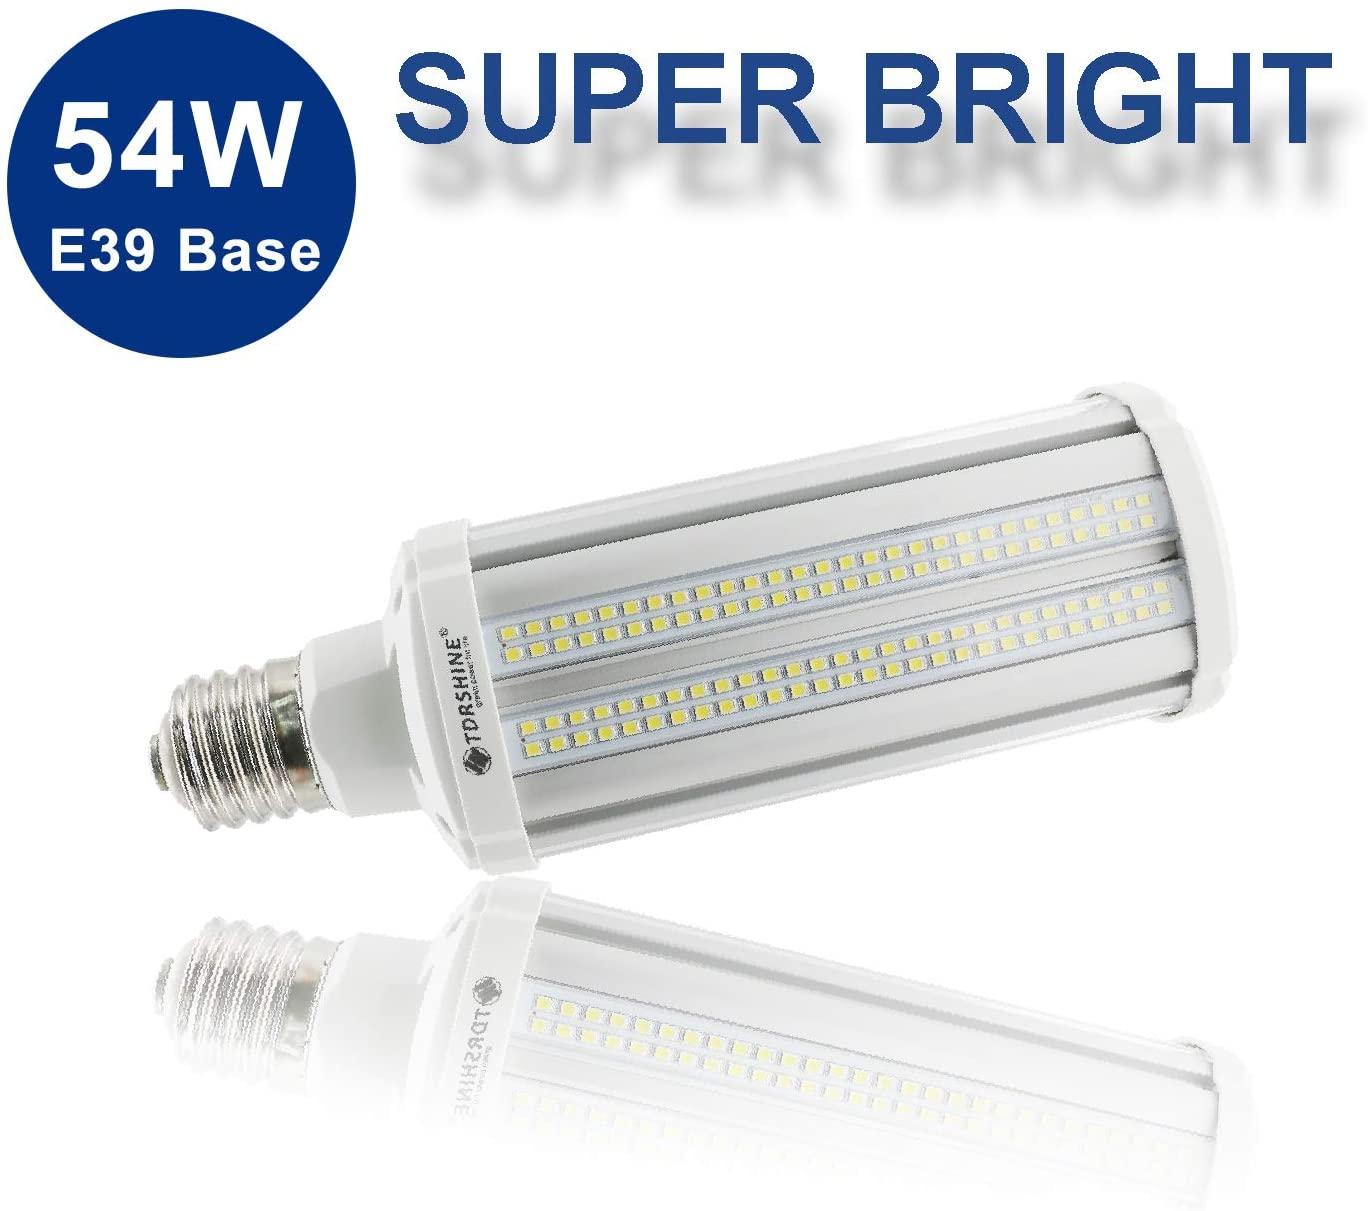 54W LED Corn Light Bulb Super Bright(400 Watt Equivalent)7020 Lumens 5000K E39 Large Mogul Base Large Area Cool Daylight White for Outdoor Indoor Garage Warehouse High Bay Barn Parking Lot Patio